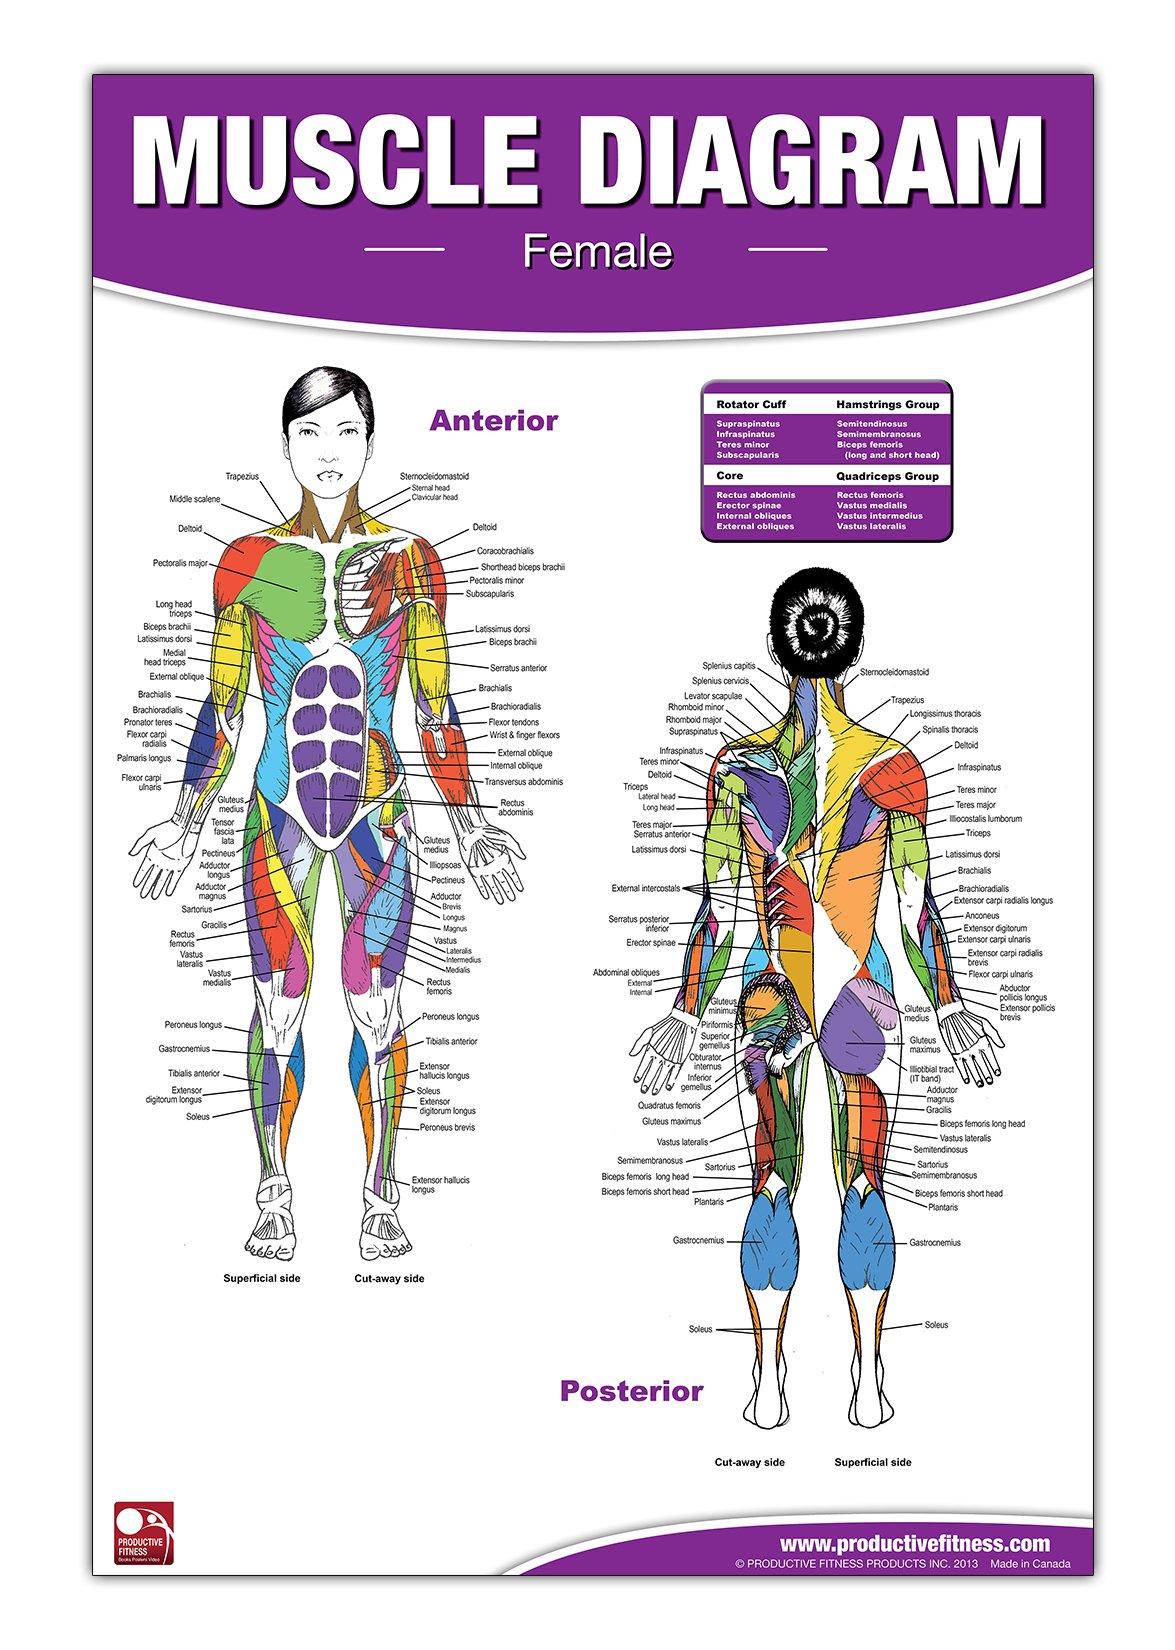 Female Muscle Diagram Andre Potvin